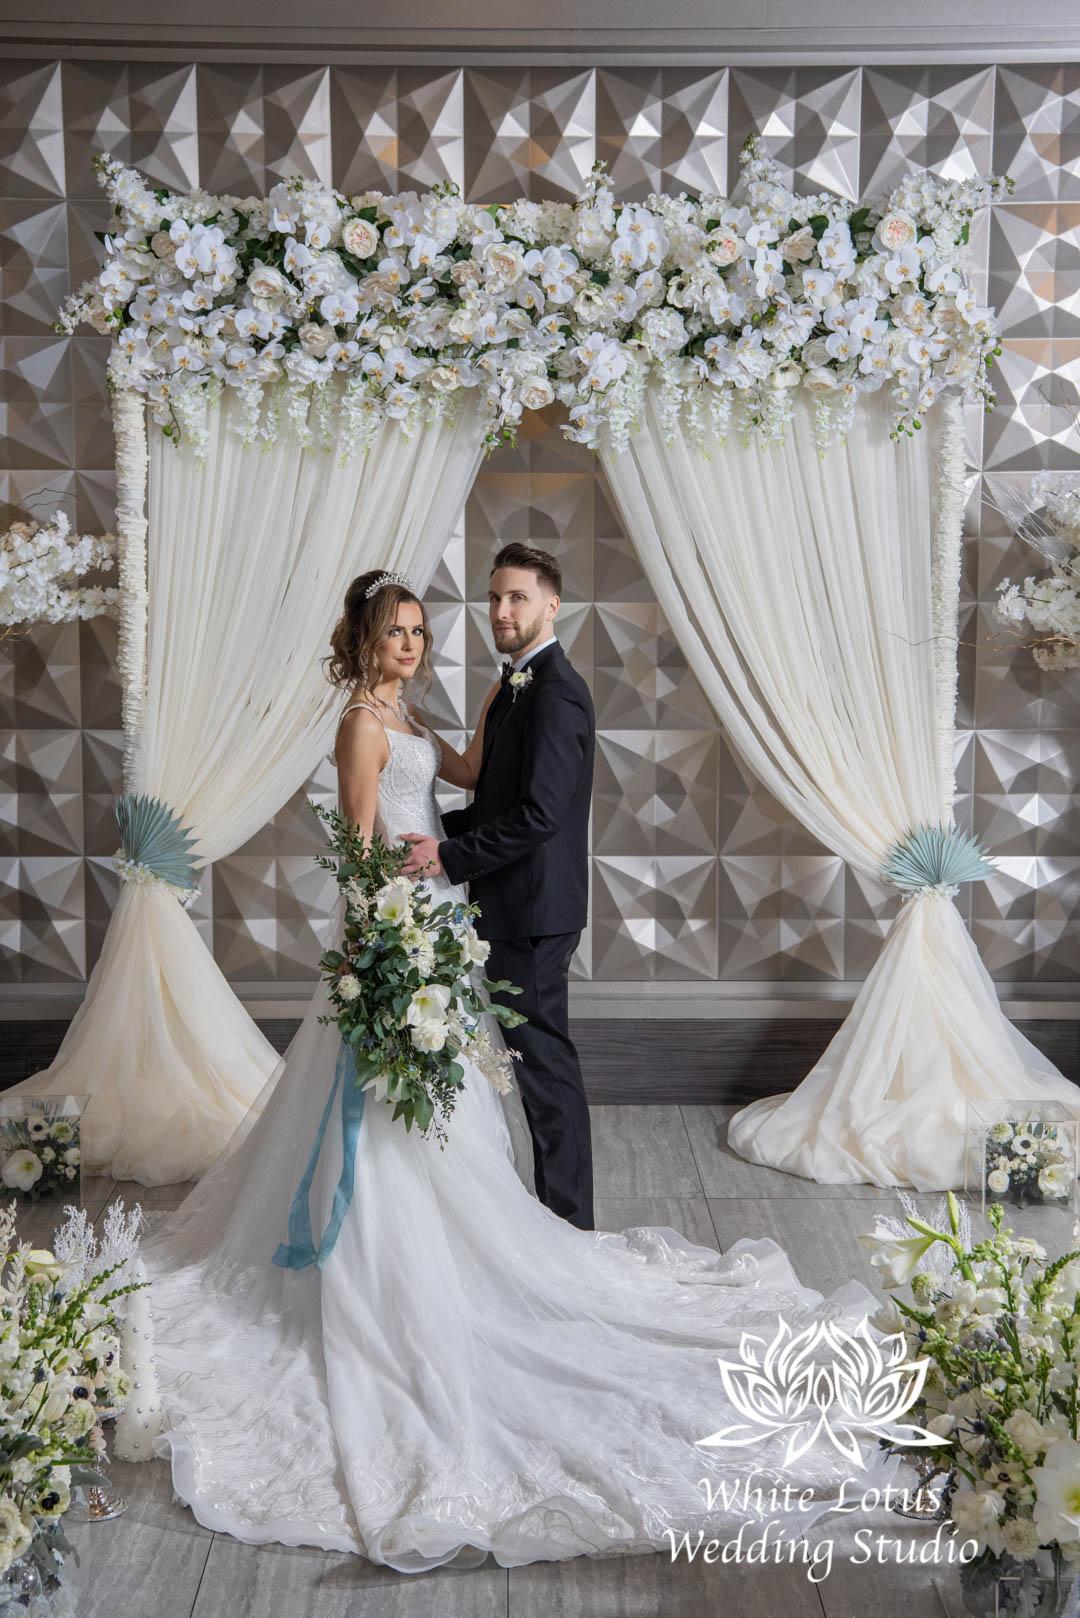 016- GLAM WINTERLUXE WEDDING INSPIRATION